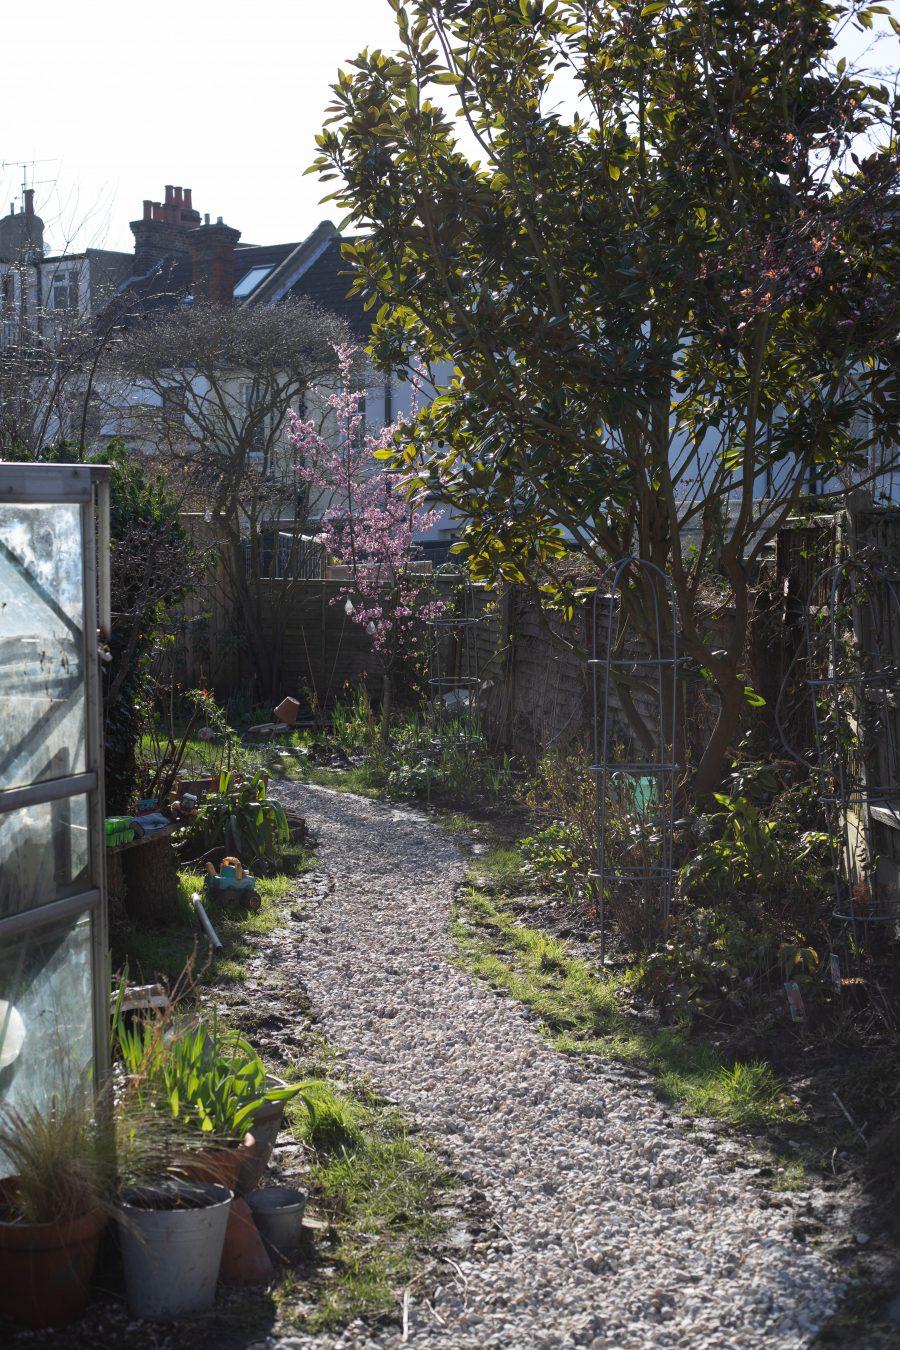 Gravel path and blossom tree